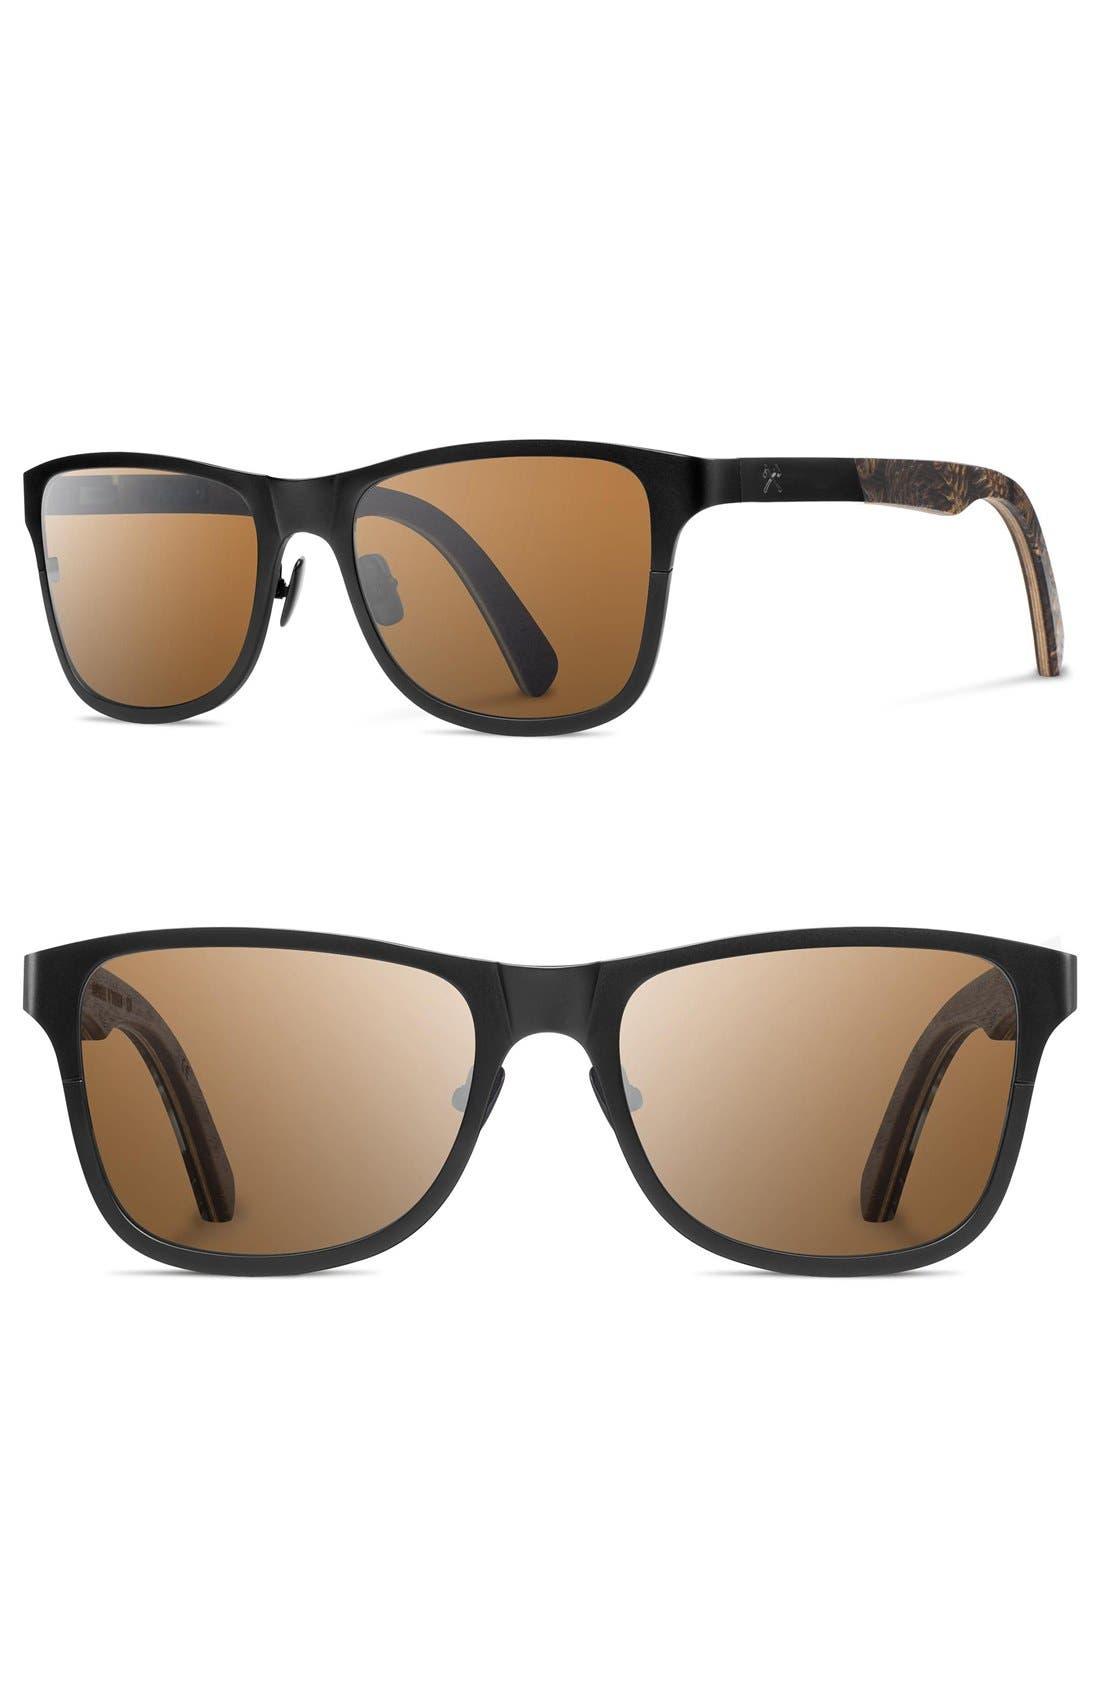 Canby 54mm Polarized Pine Cone & Titanium Sunglasses,                             Main thumbnail 1, color,                             BLACK/ PINECONE/ BROWN